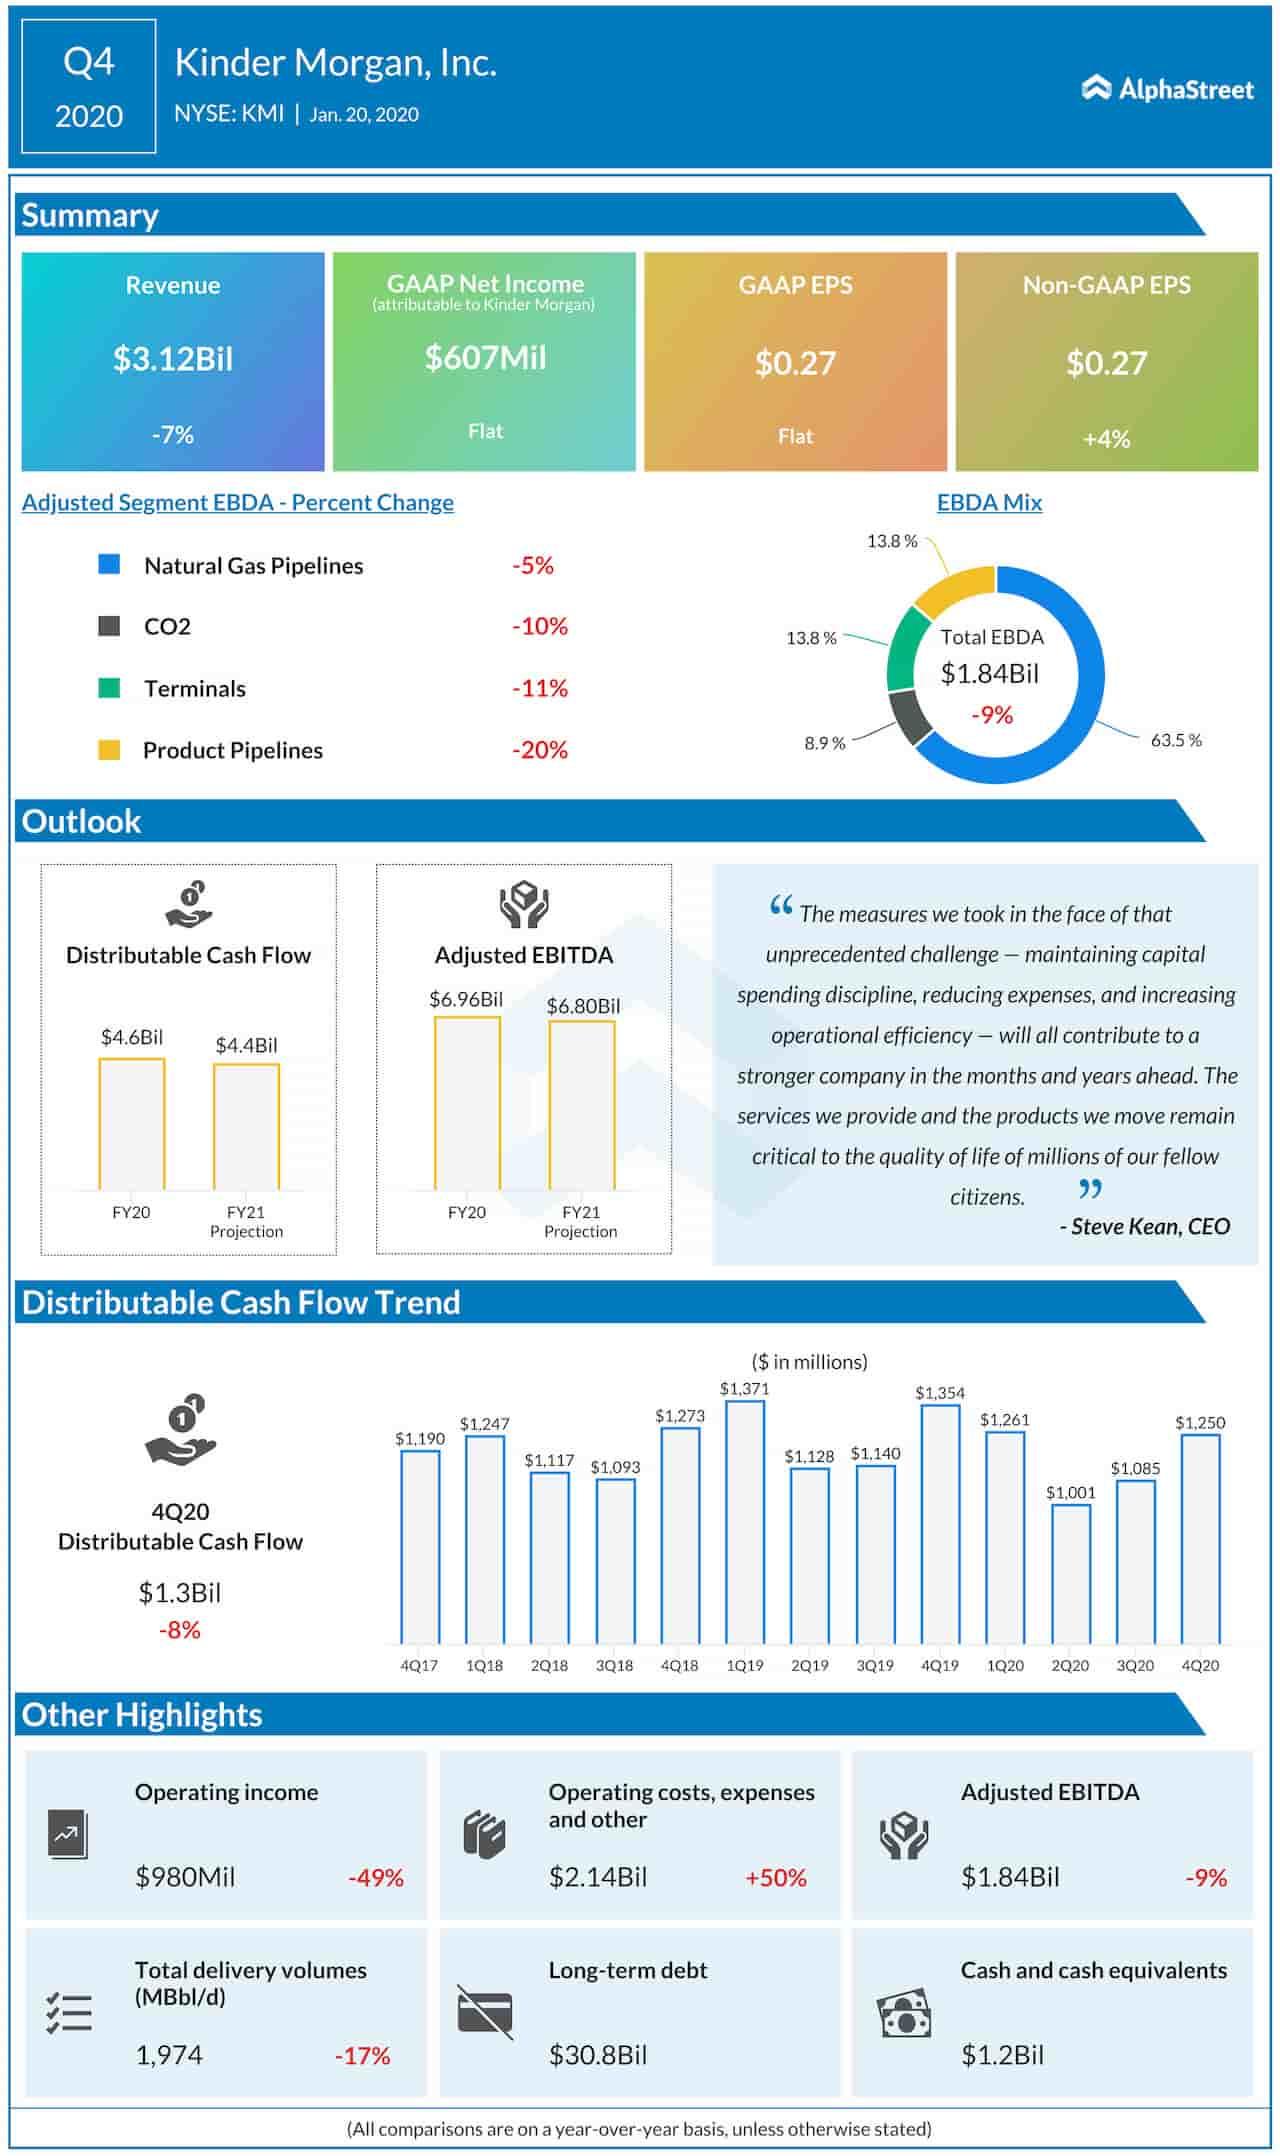 Kinder Morgan Q4 2020 earnings infographic